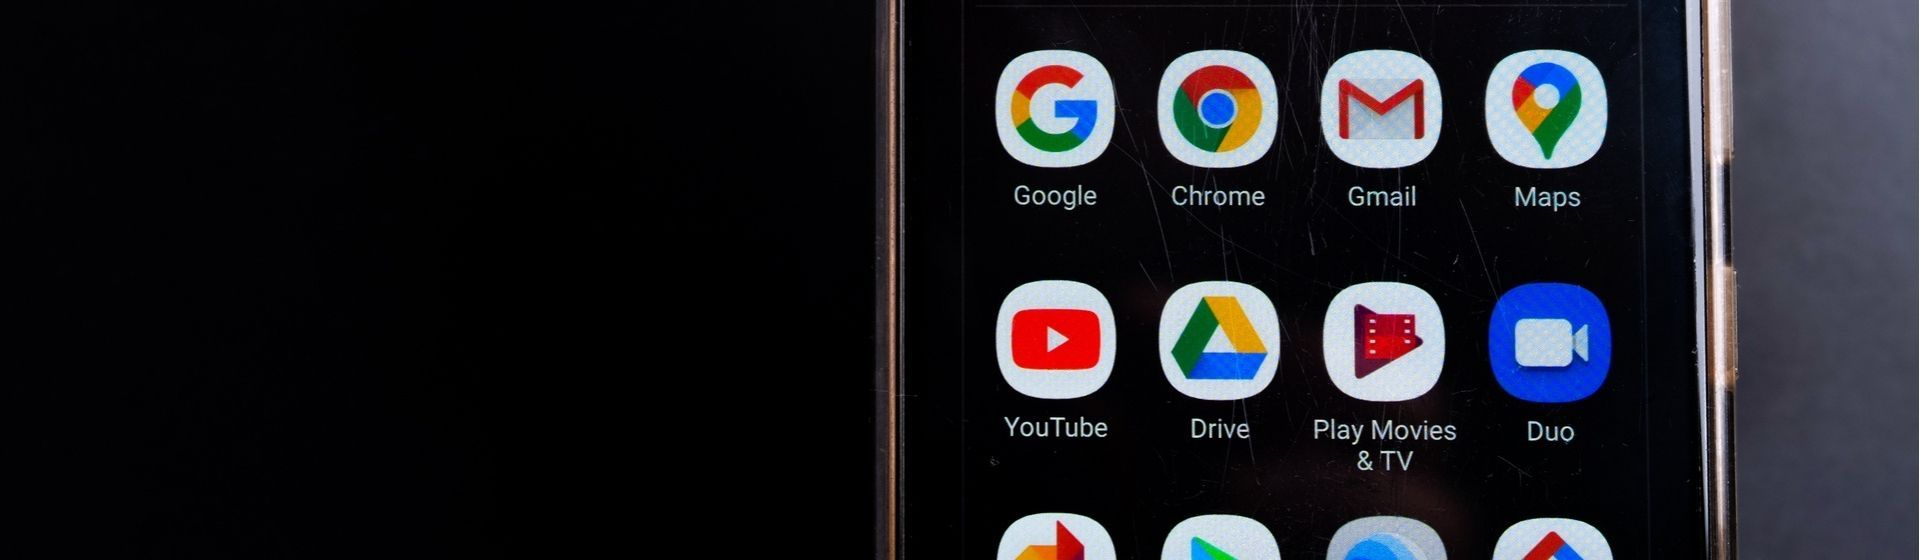 Como deixar o Google preto